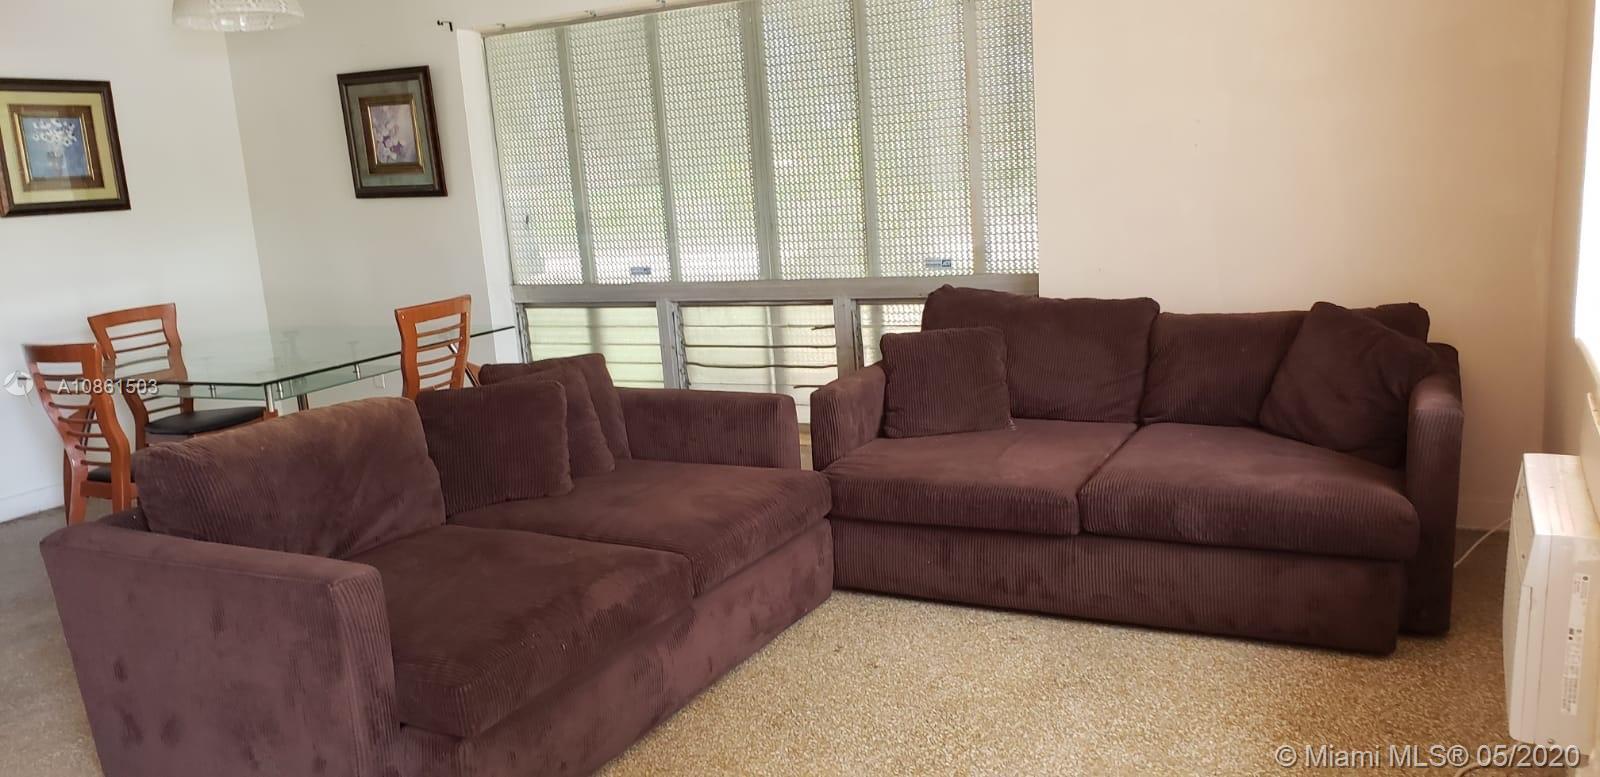 2915 NE 214 ST #1 For Sale A10861503, FL